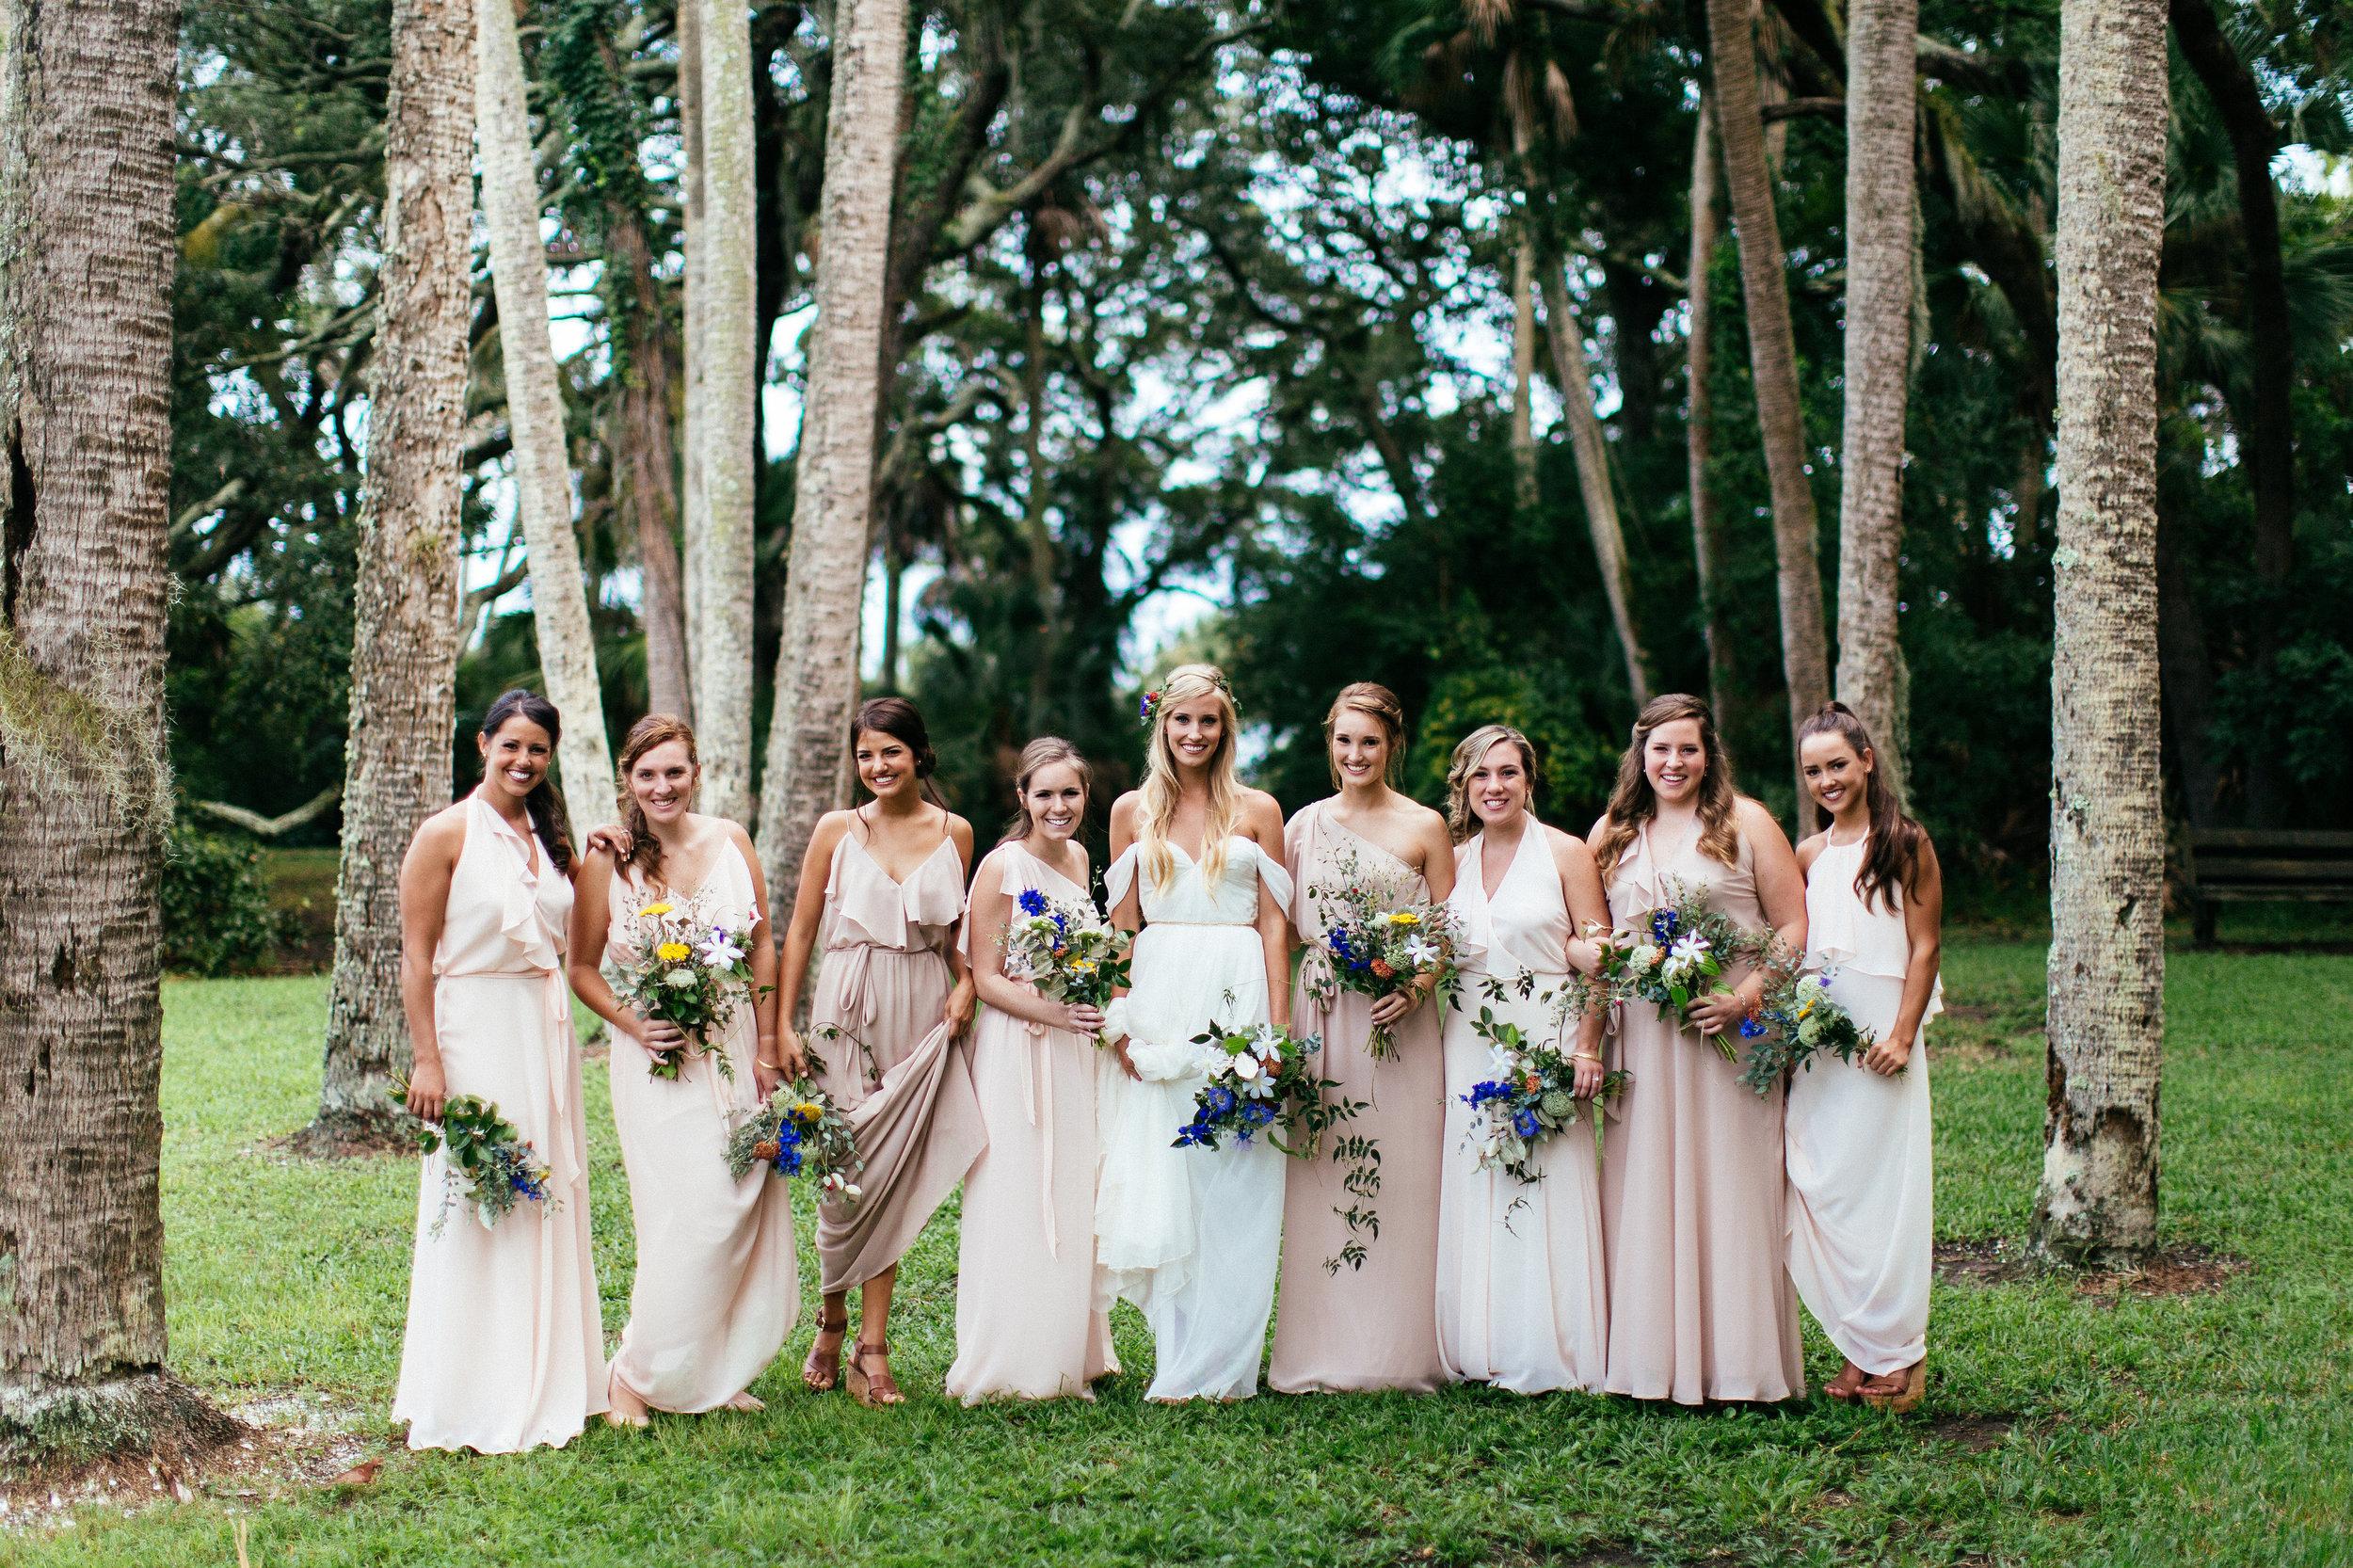 christina-karst-photography-ivory-and-beau-bridal-boutique-sarah-seven-lafayette-boho-bride-boho-bridal-boutique-indie-bridal-boutique-savannah-bridal-boutique-savannah-wedding-dresses-savannah-bridal-gowns-7.jpg